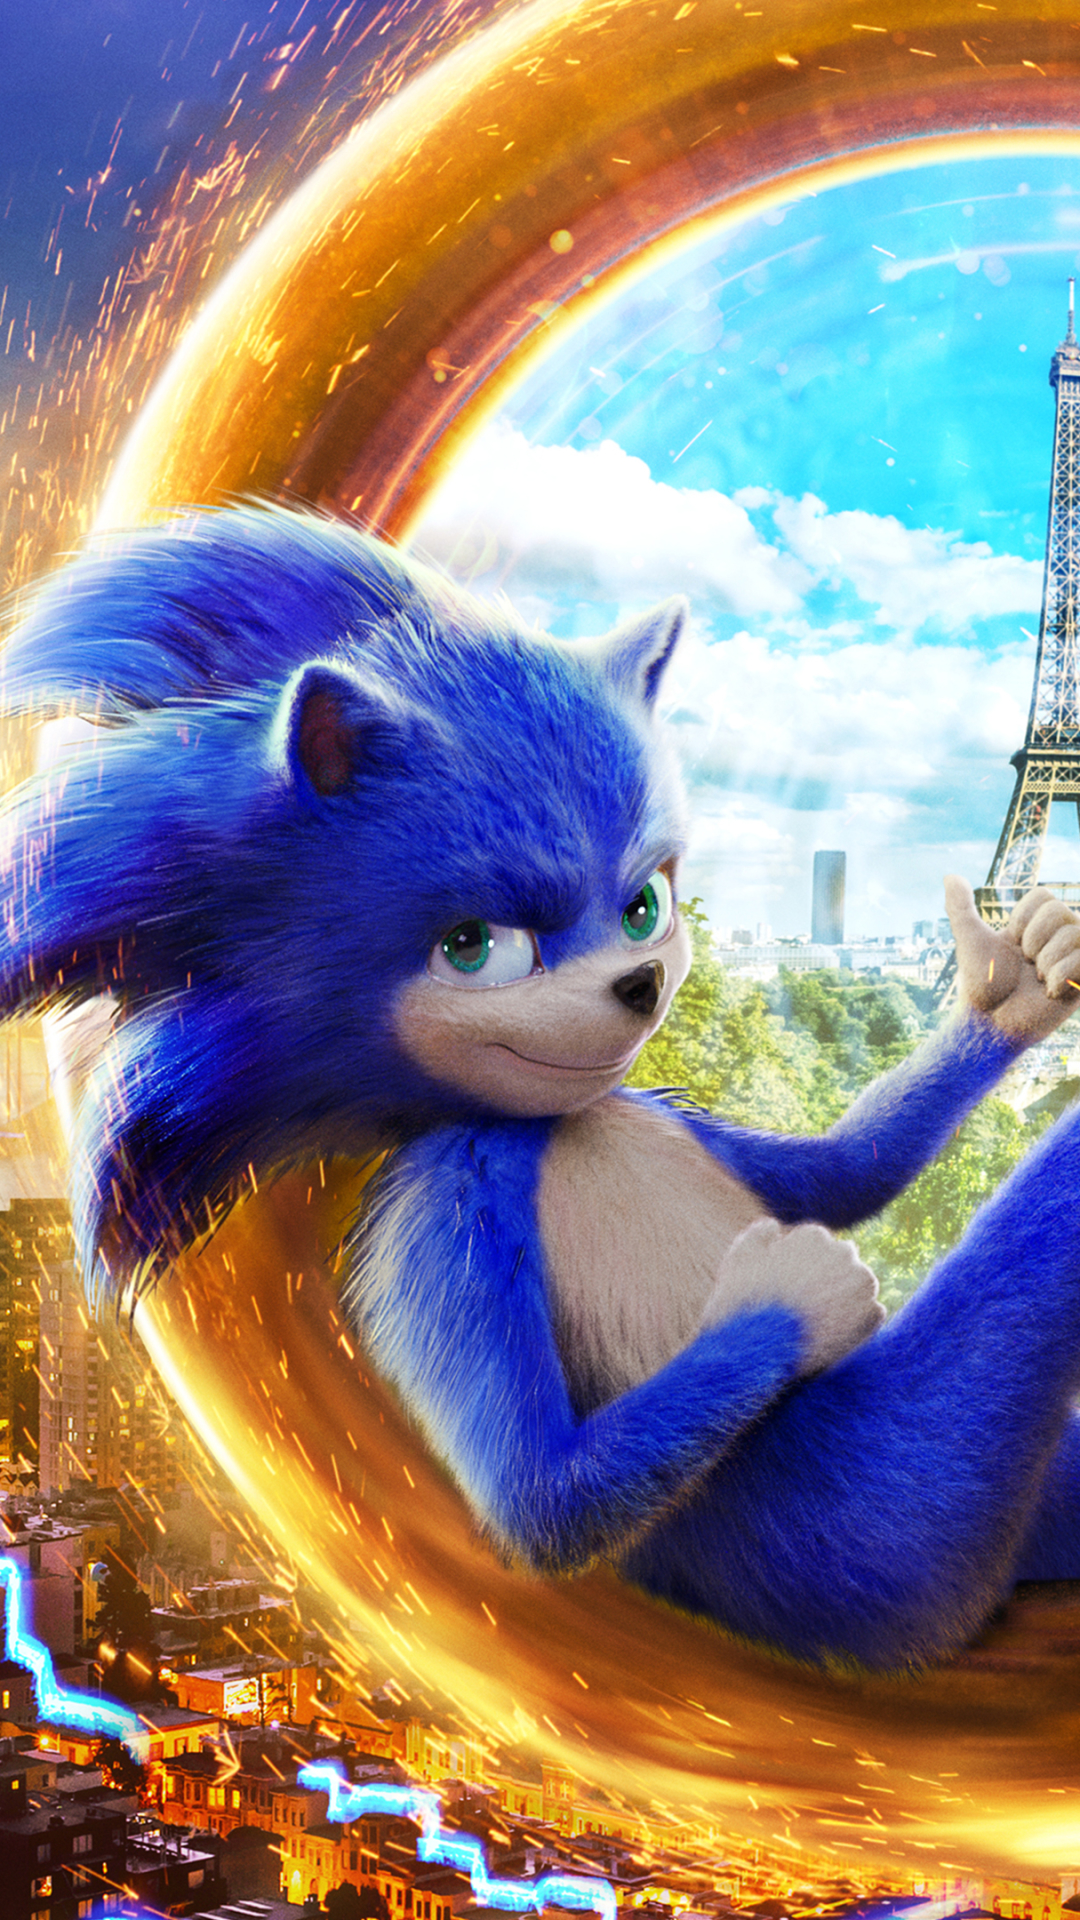 Free Download Moviesonic The Hedgehog 2020 1080x1920 Wallpaper Id